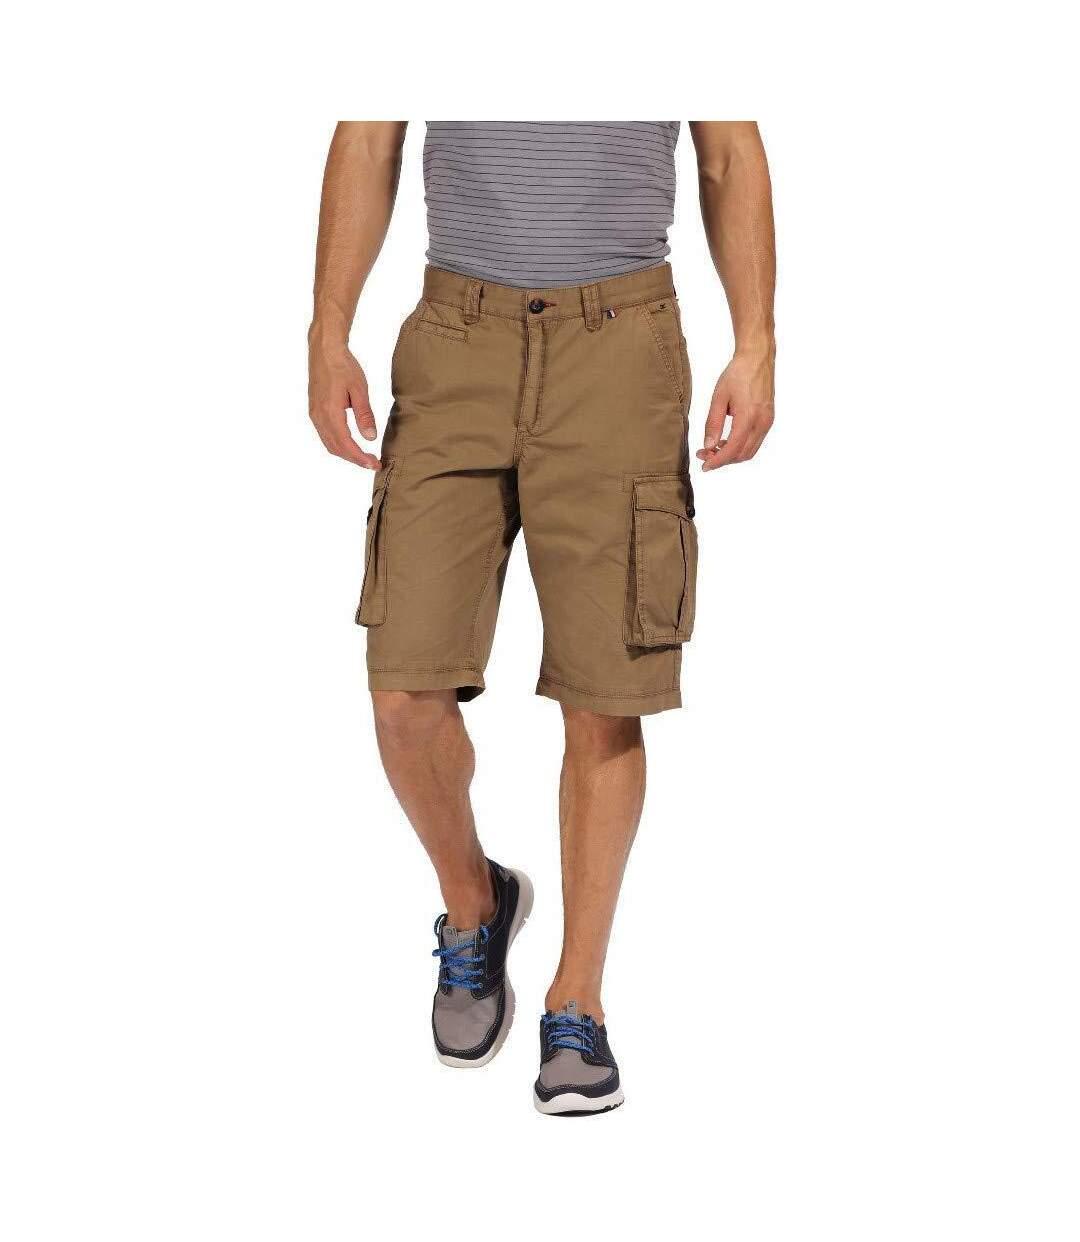 Regatta Mens Salvador II Vintage Look Shorts (Navy) - UTRG4166